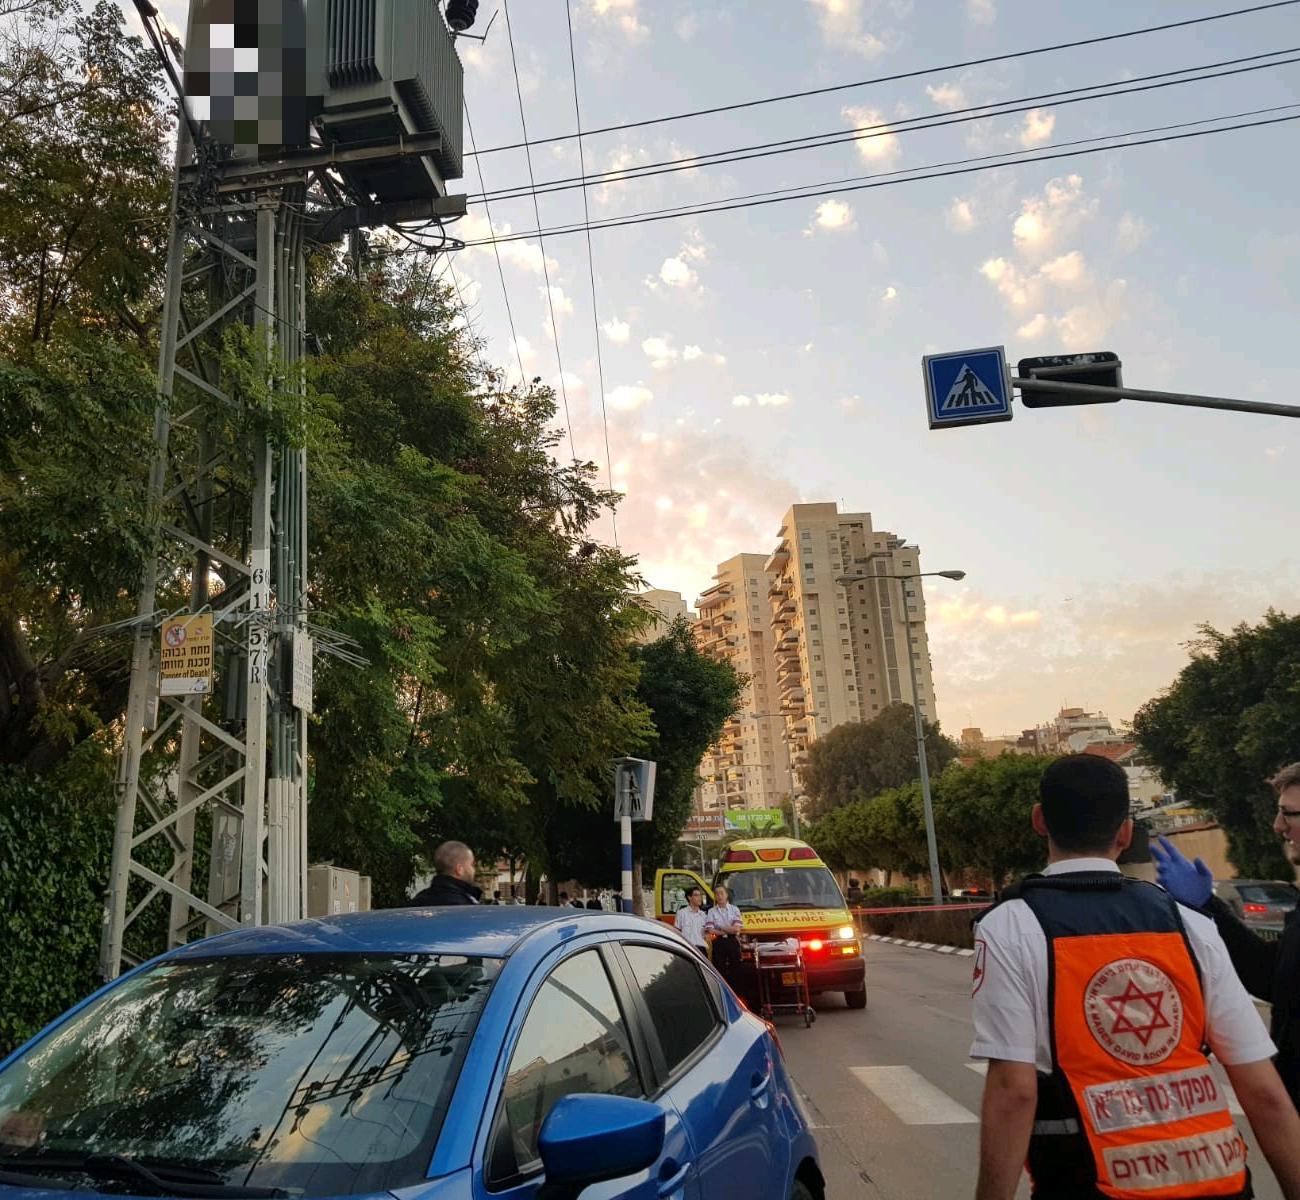 "Photo of טרגדיה בראשל""צ. צעירה בת 20 התחשמלה למוות כשטיפסה, ככל הנראה בכוונה אובדנית, על עמוד חשמל ברחוב הקוקיה בעיר"